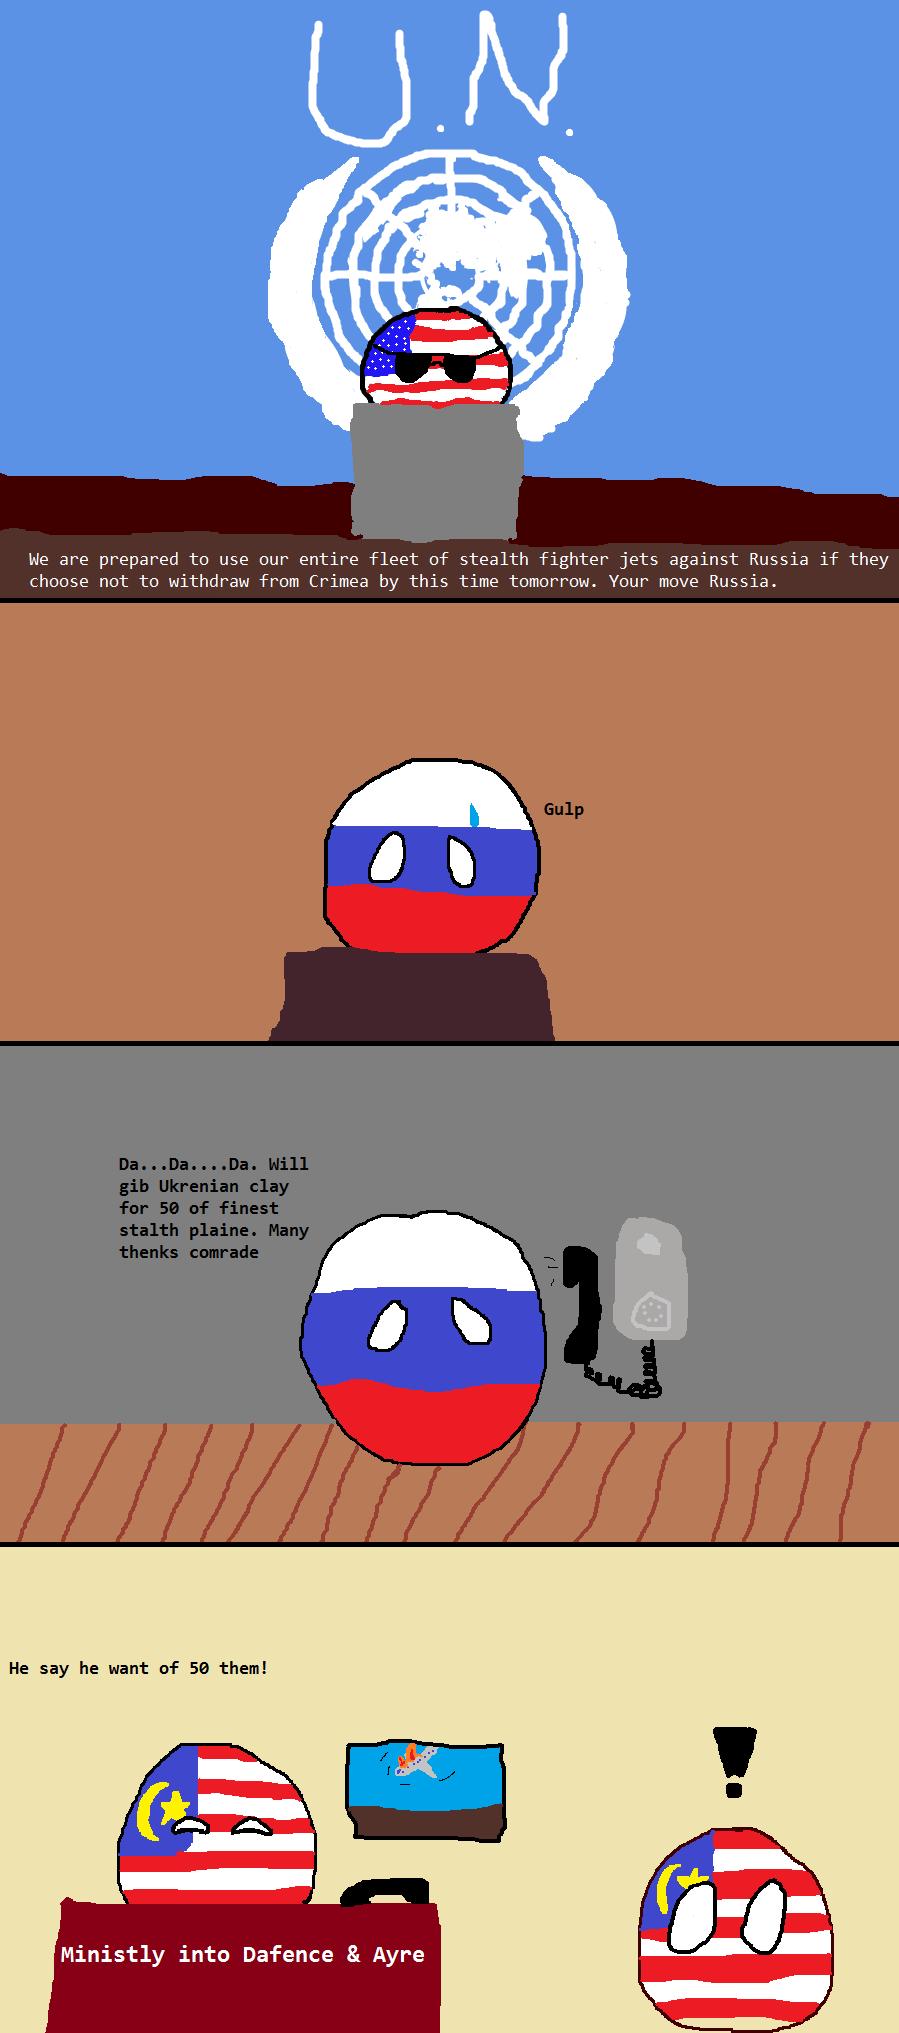 File:Your move russia Polandball.png - Wikimedia Commons